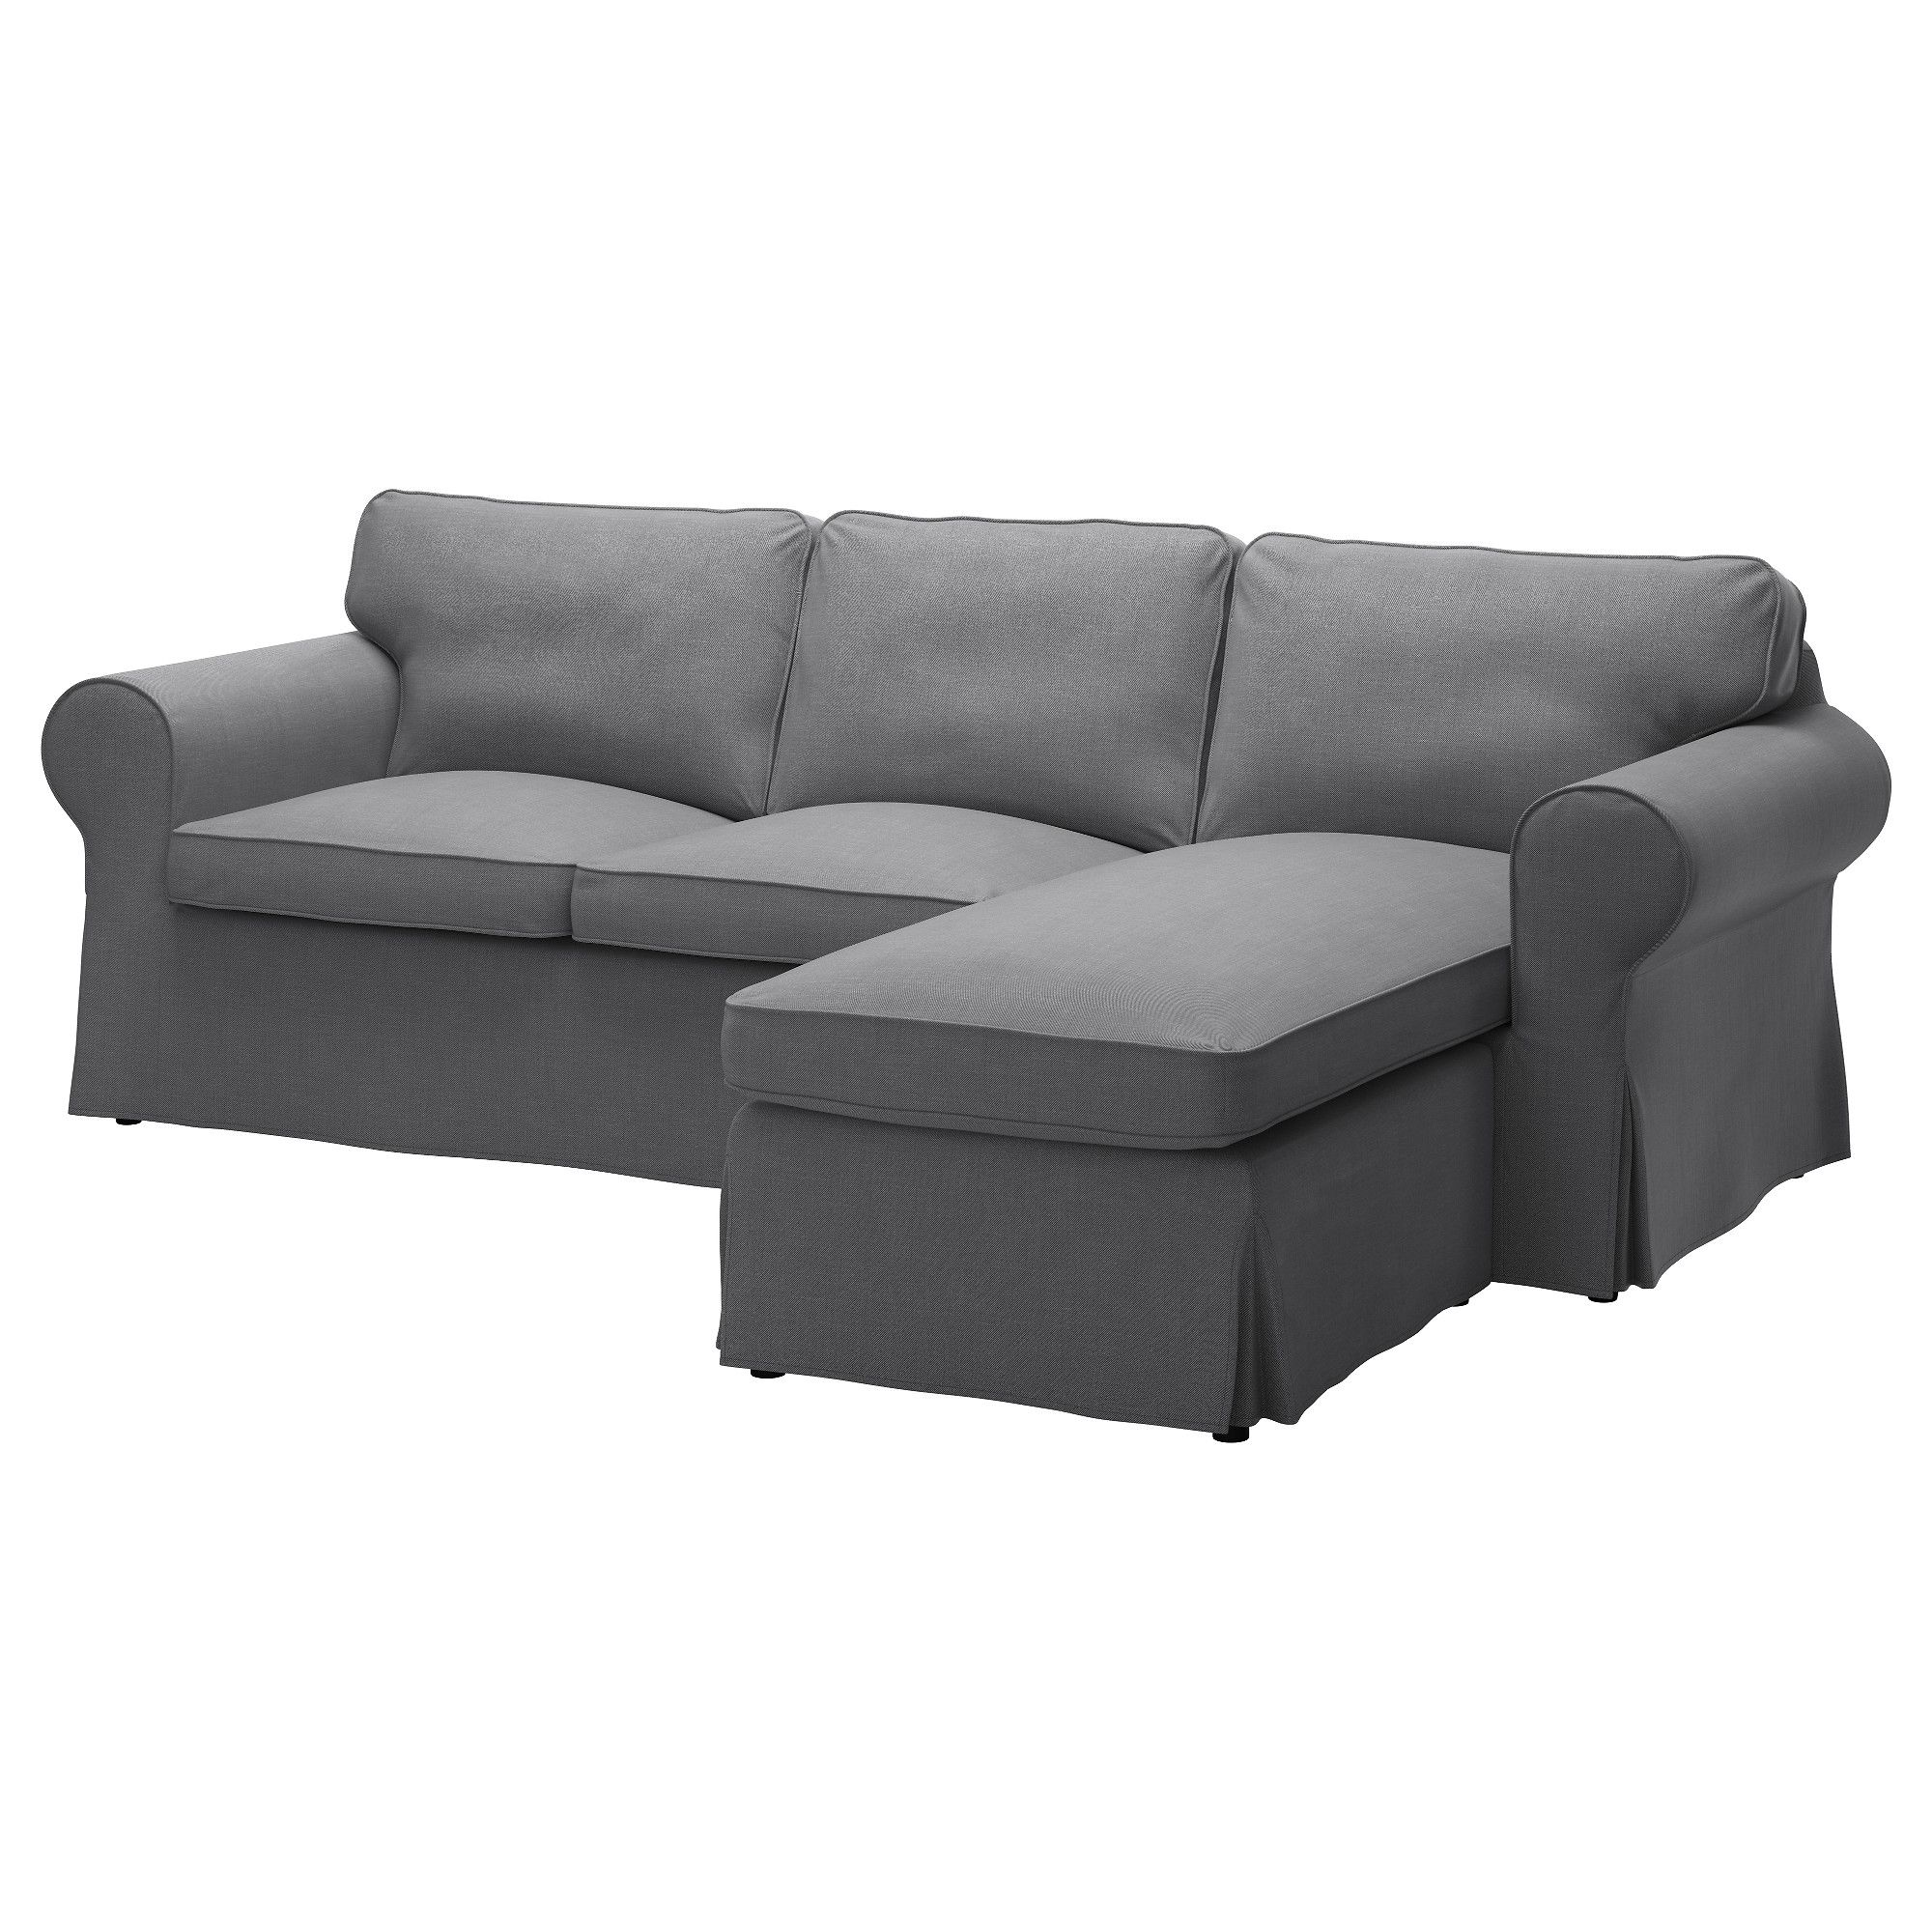 EKTORP Bezug 2er Sofa mit Récamiere Nordvalla dunkelgrau